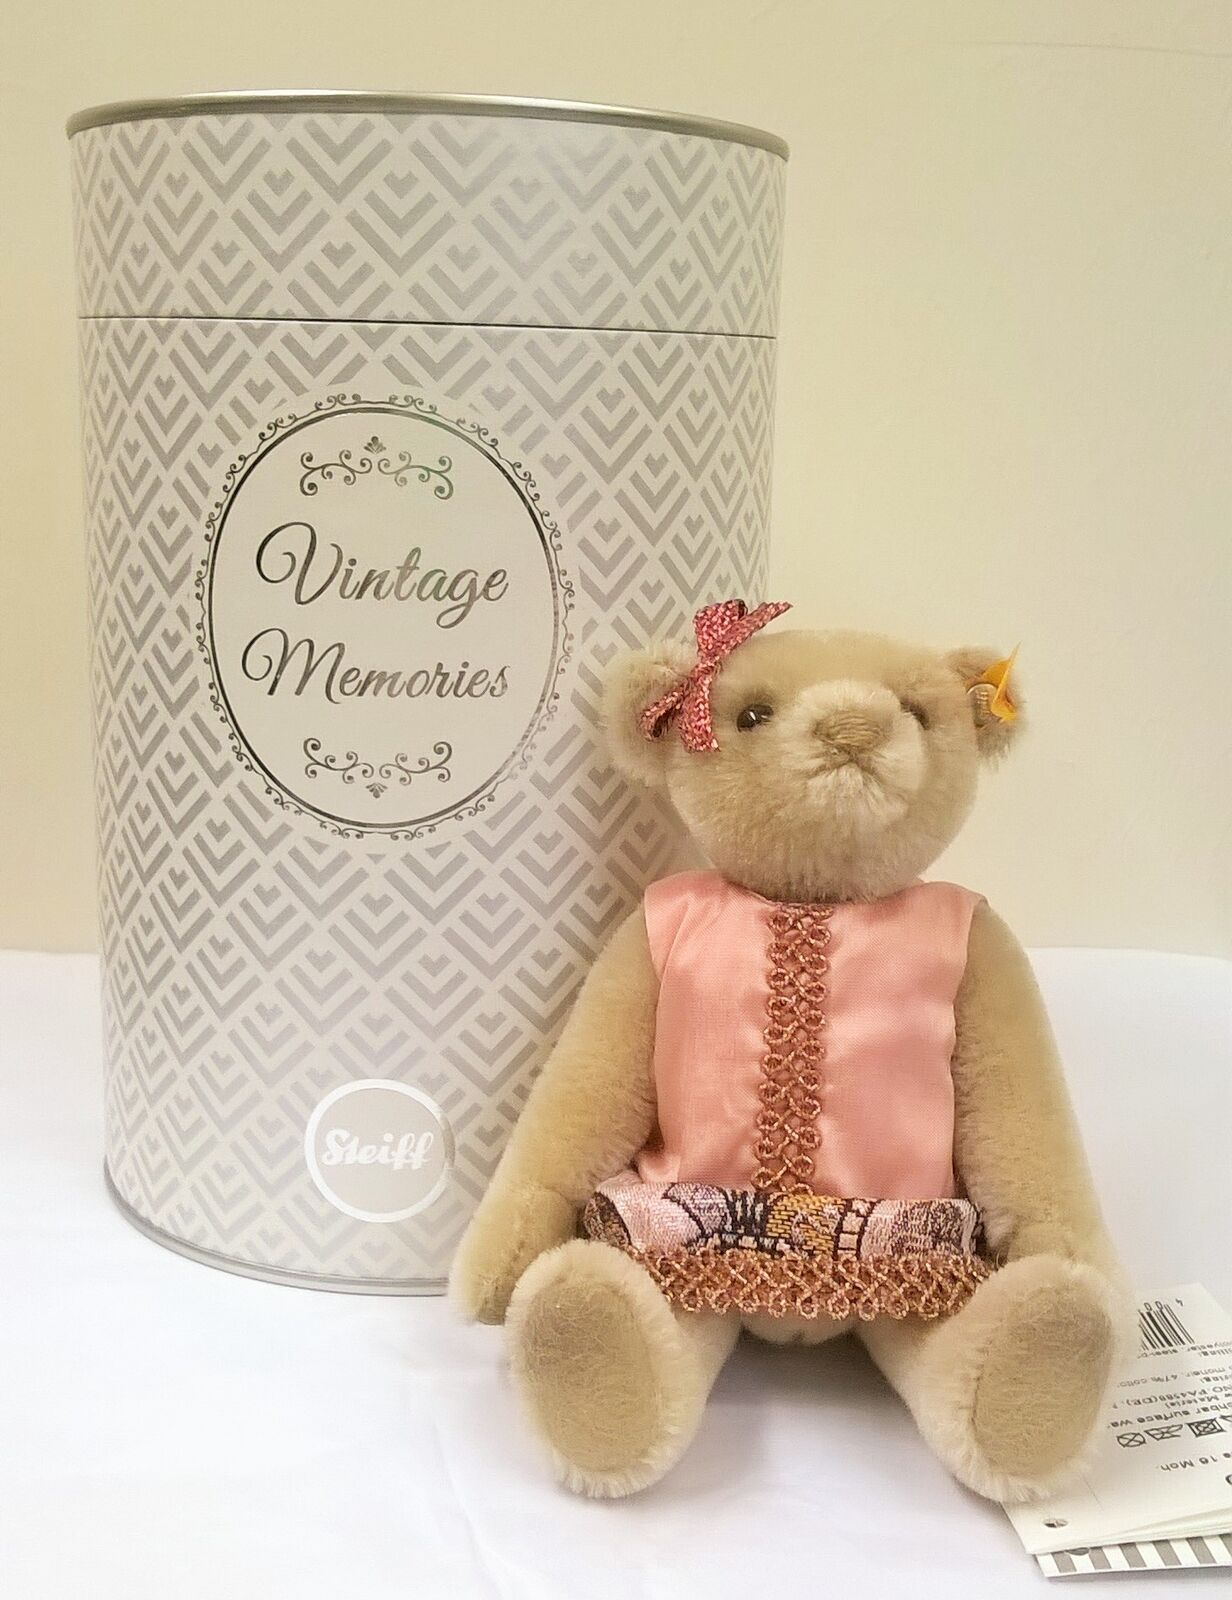 026850 Vintage Memories Tess Teddy bear in gift box by Steiff